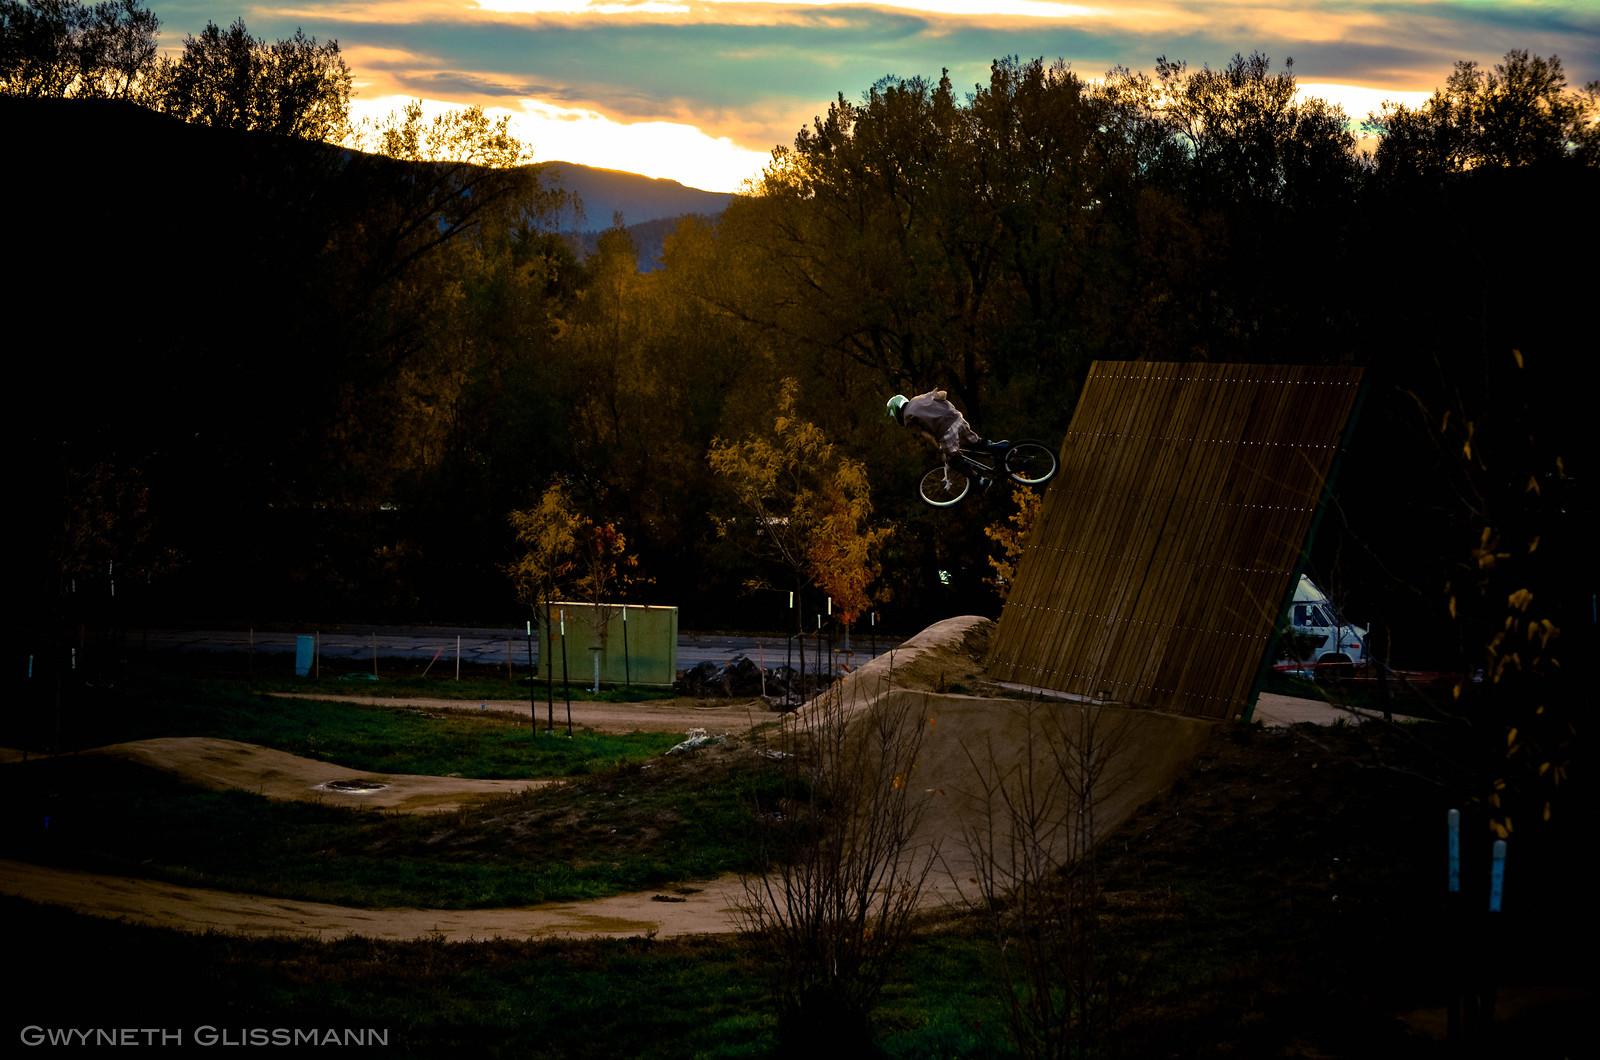 Kevin Rauhauser at Valmont Bike Park - rhiannon - Mountain Biking Pictures - Vital MTB